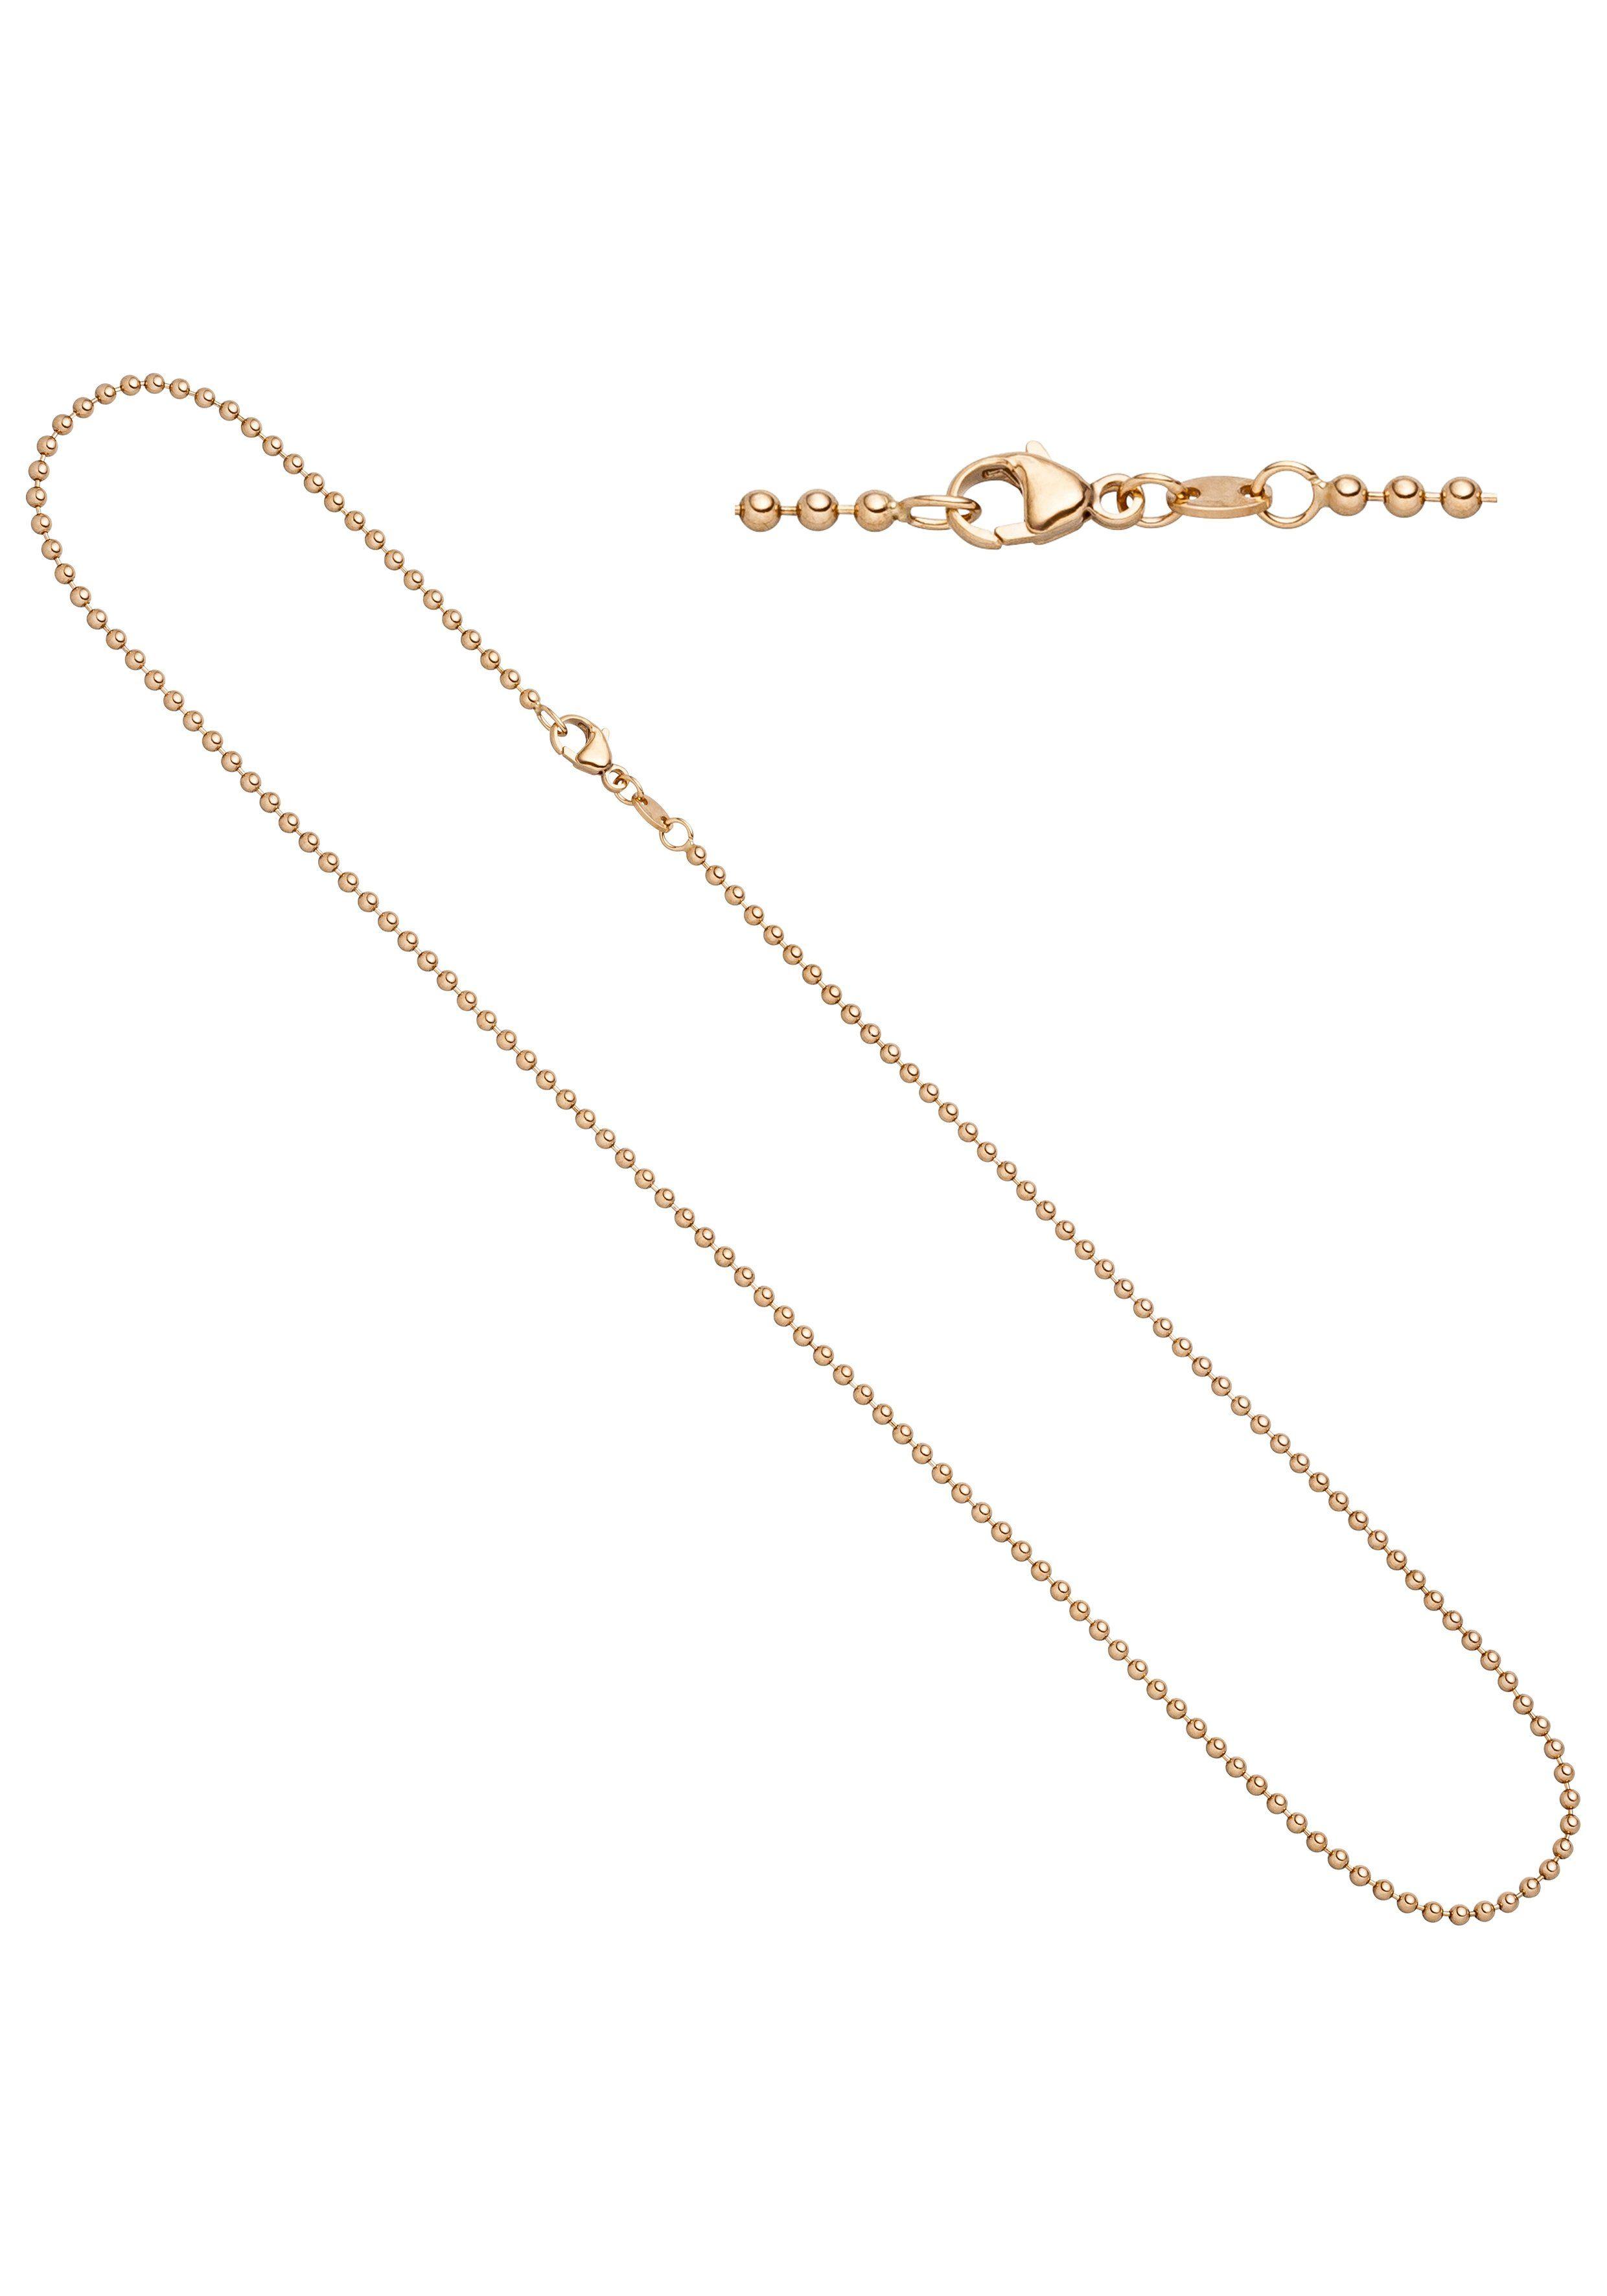 JOBO Goldkette Kugelkette 585 Roségold 45 cm 2,0 mm